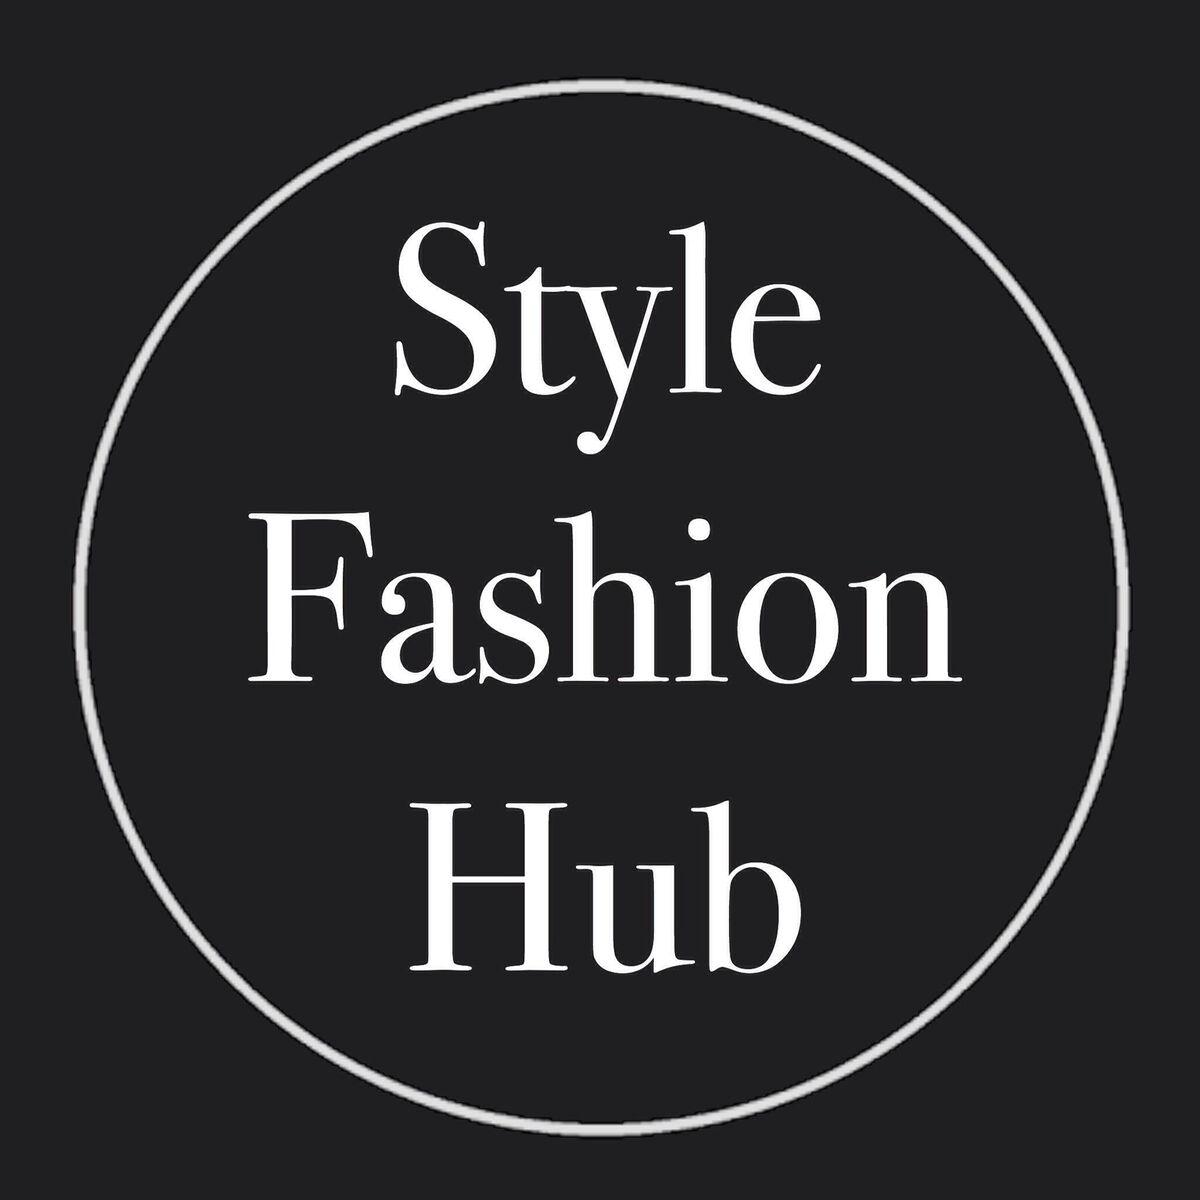 Style Fashion Hub -- Fusion Store